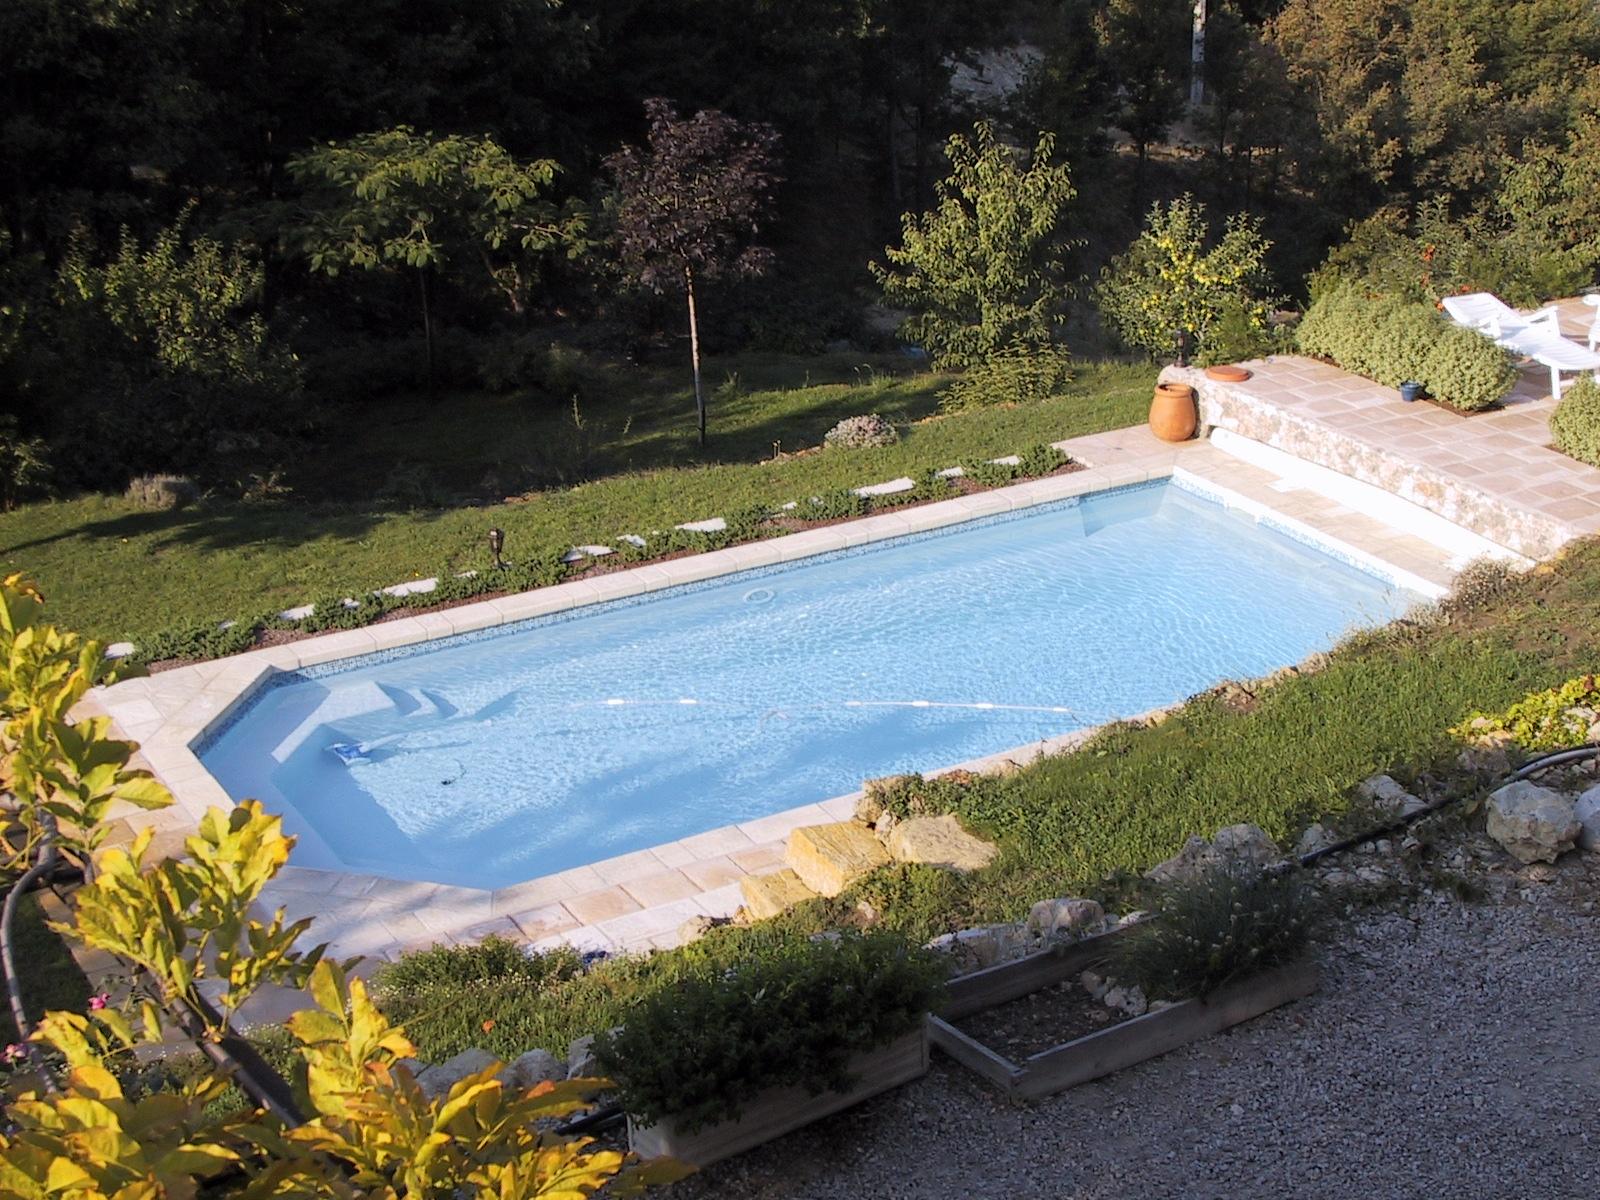 l c piscine construction entretien piscines etanch it des piscines s curit des piscines dans. Black Bedroom Furniture Sets. Home Design Ideas